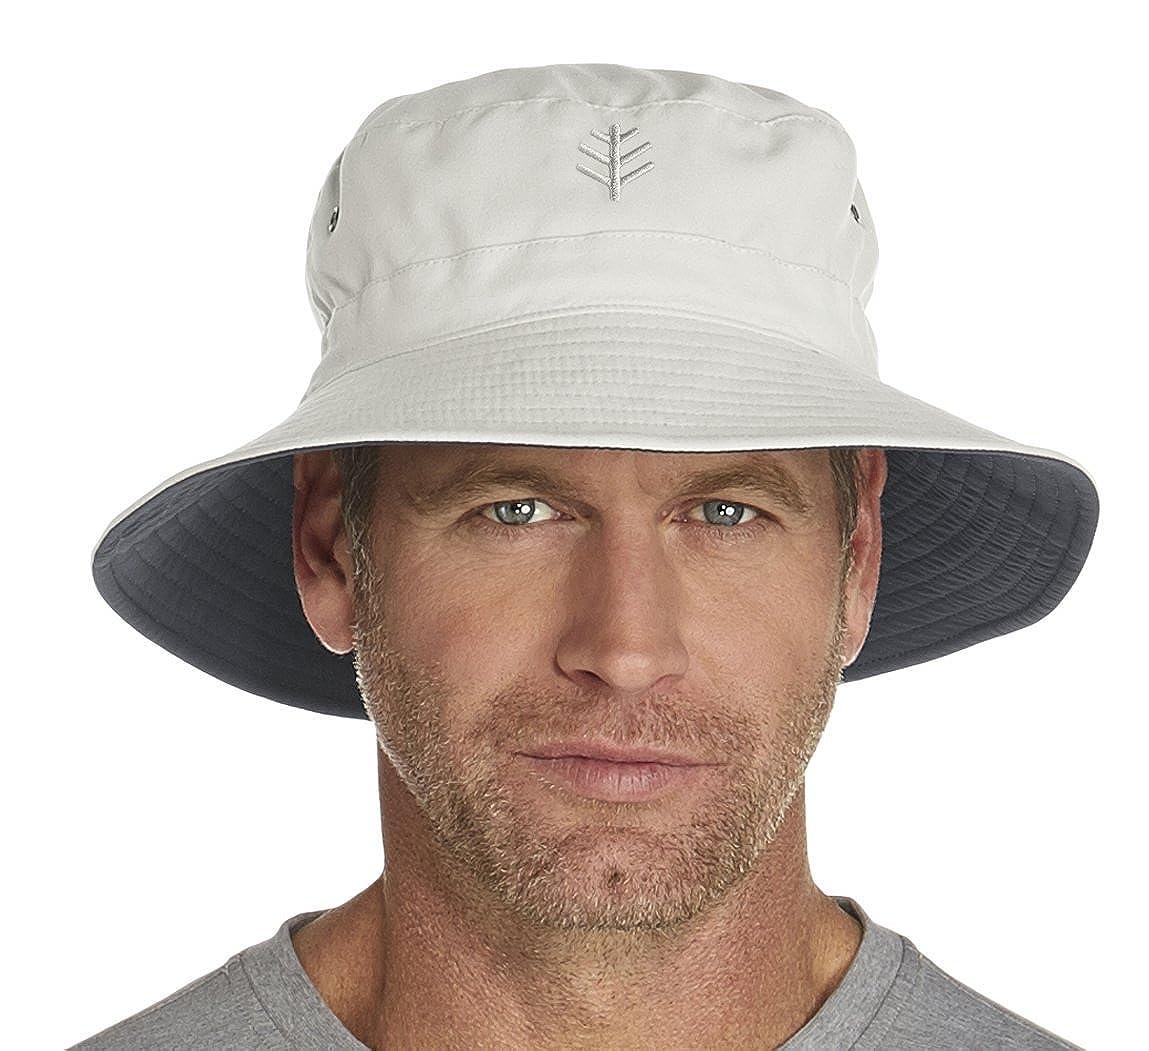 ff9c9fa3bec Coolibar UPF 50+ Men s Reversible Bucket Hat - Sun Protective ...